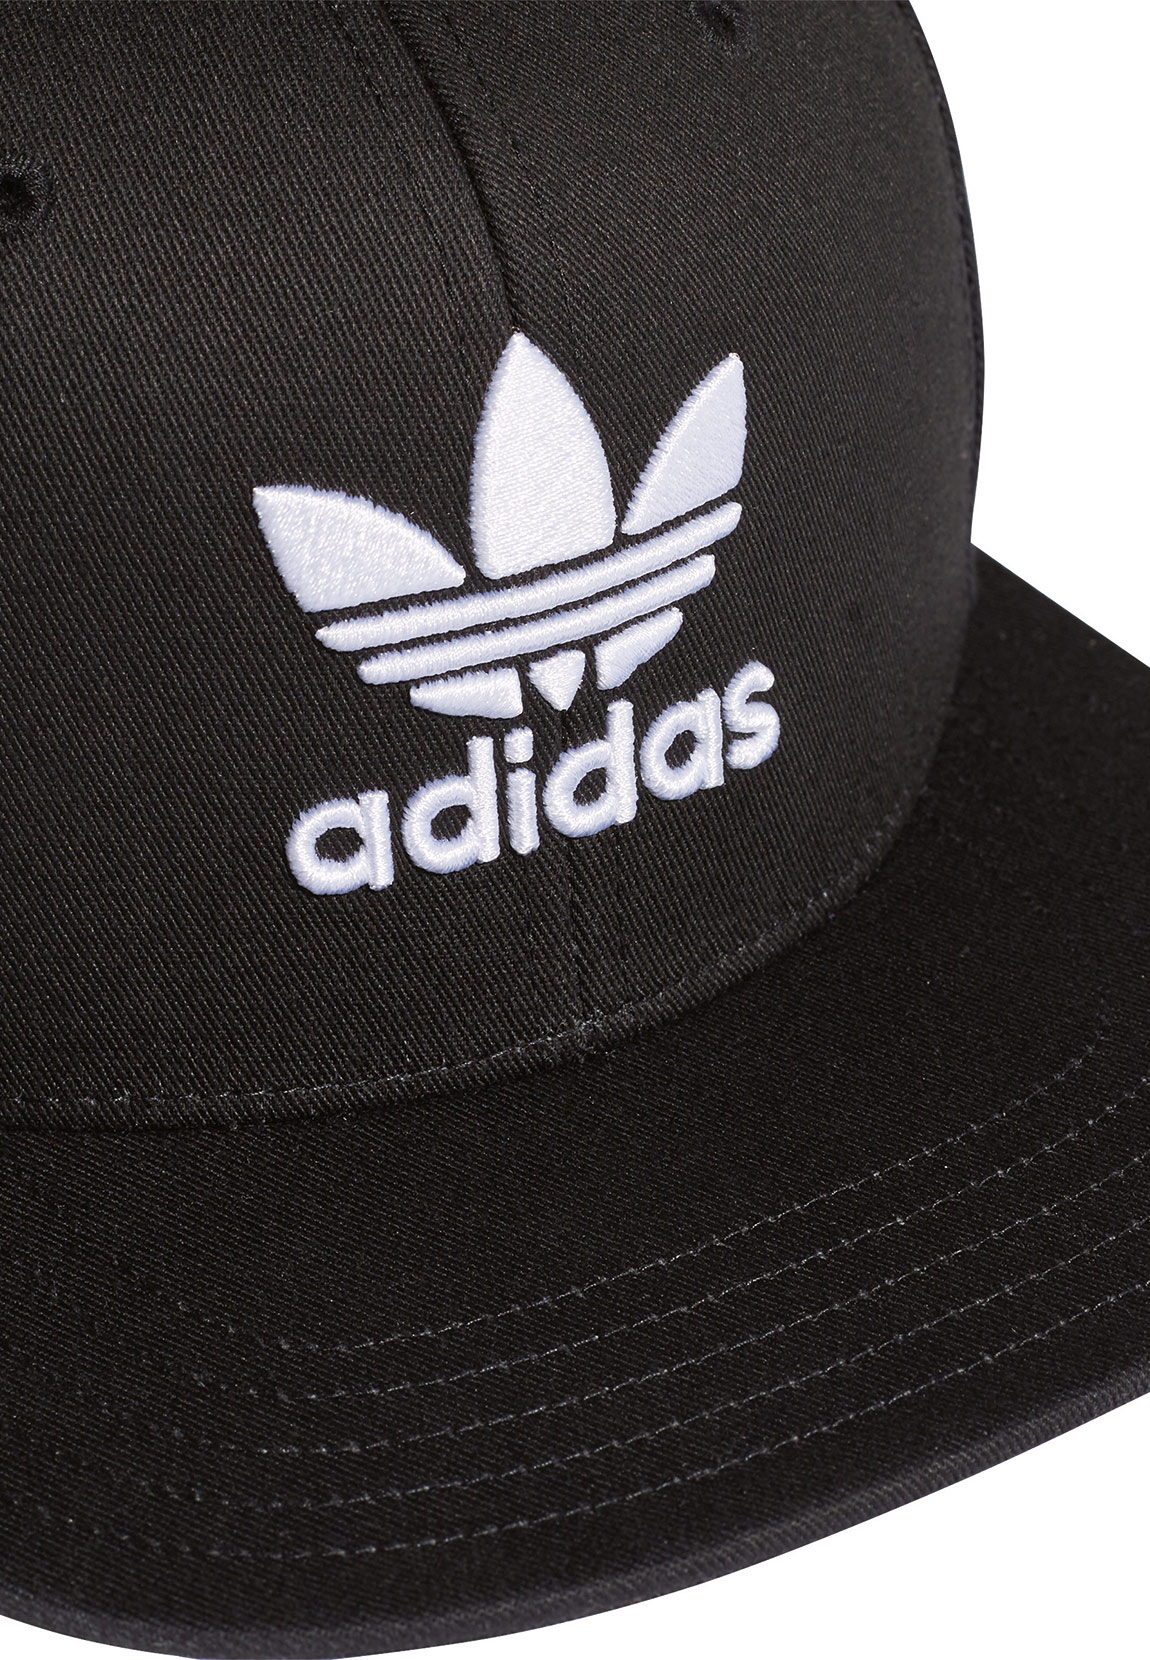 Details about Adidas Originals Snapback Sb Classic Tre DV0176 Black